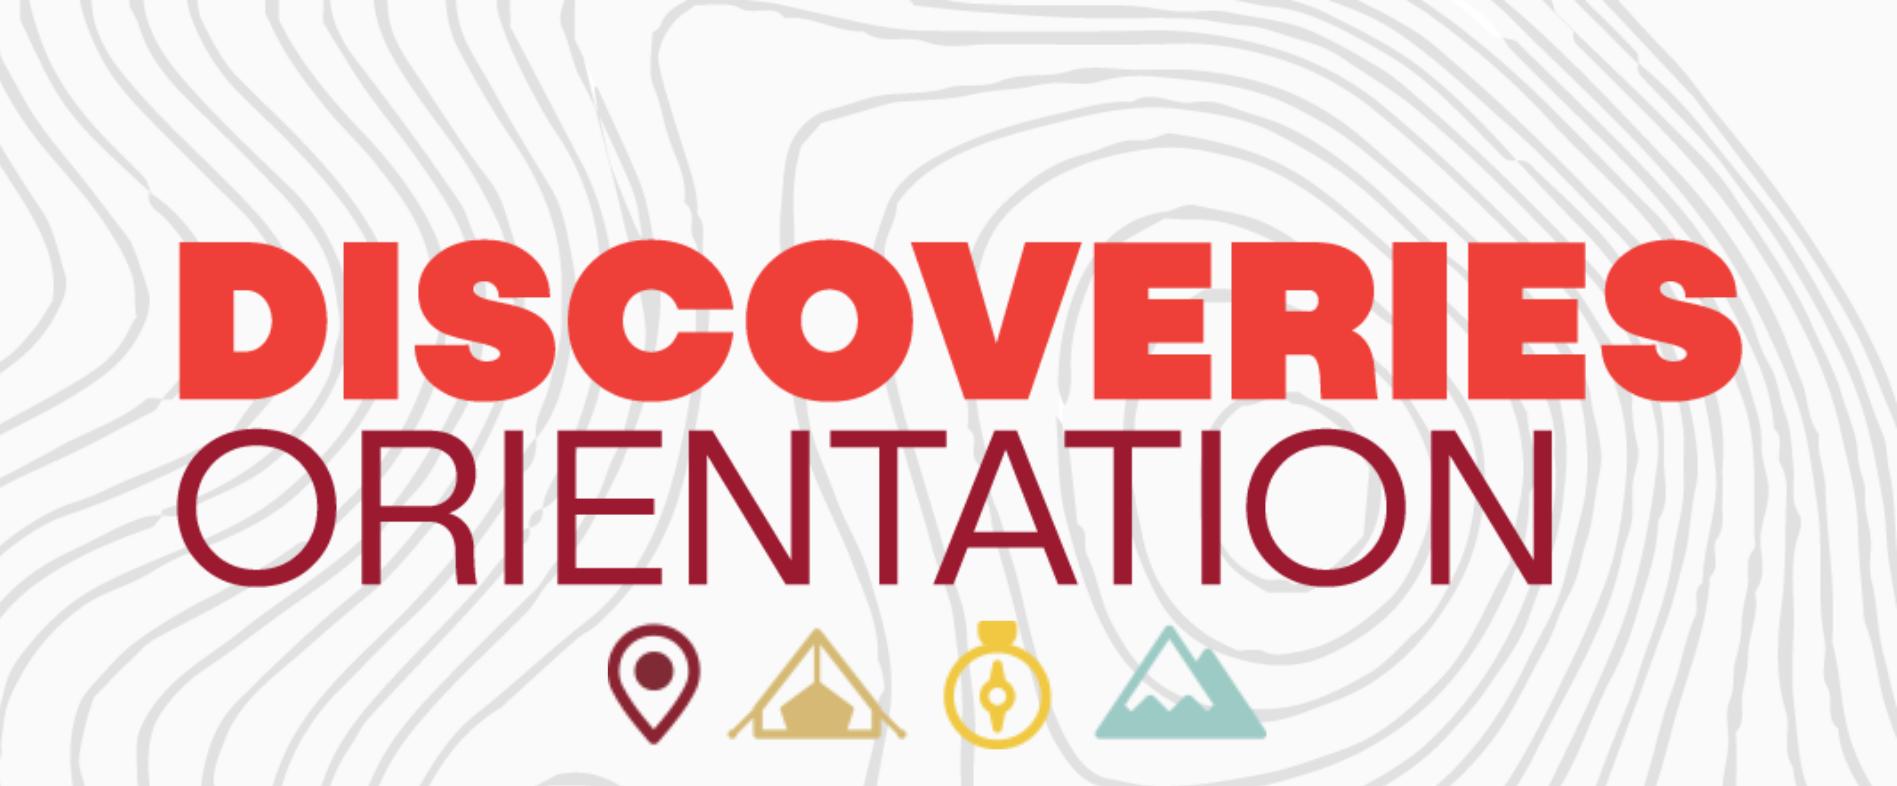 Discoveries Orientation Logo